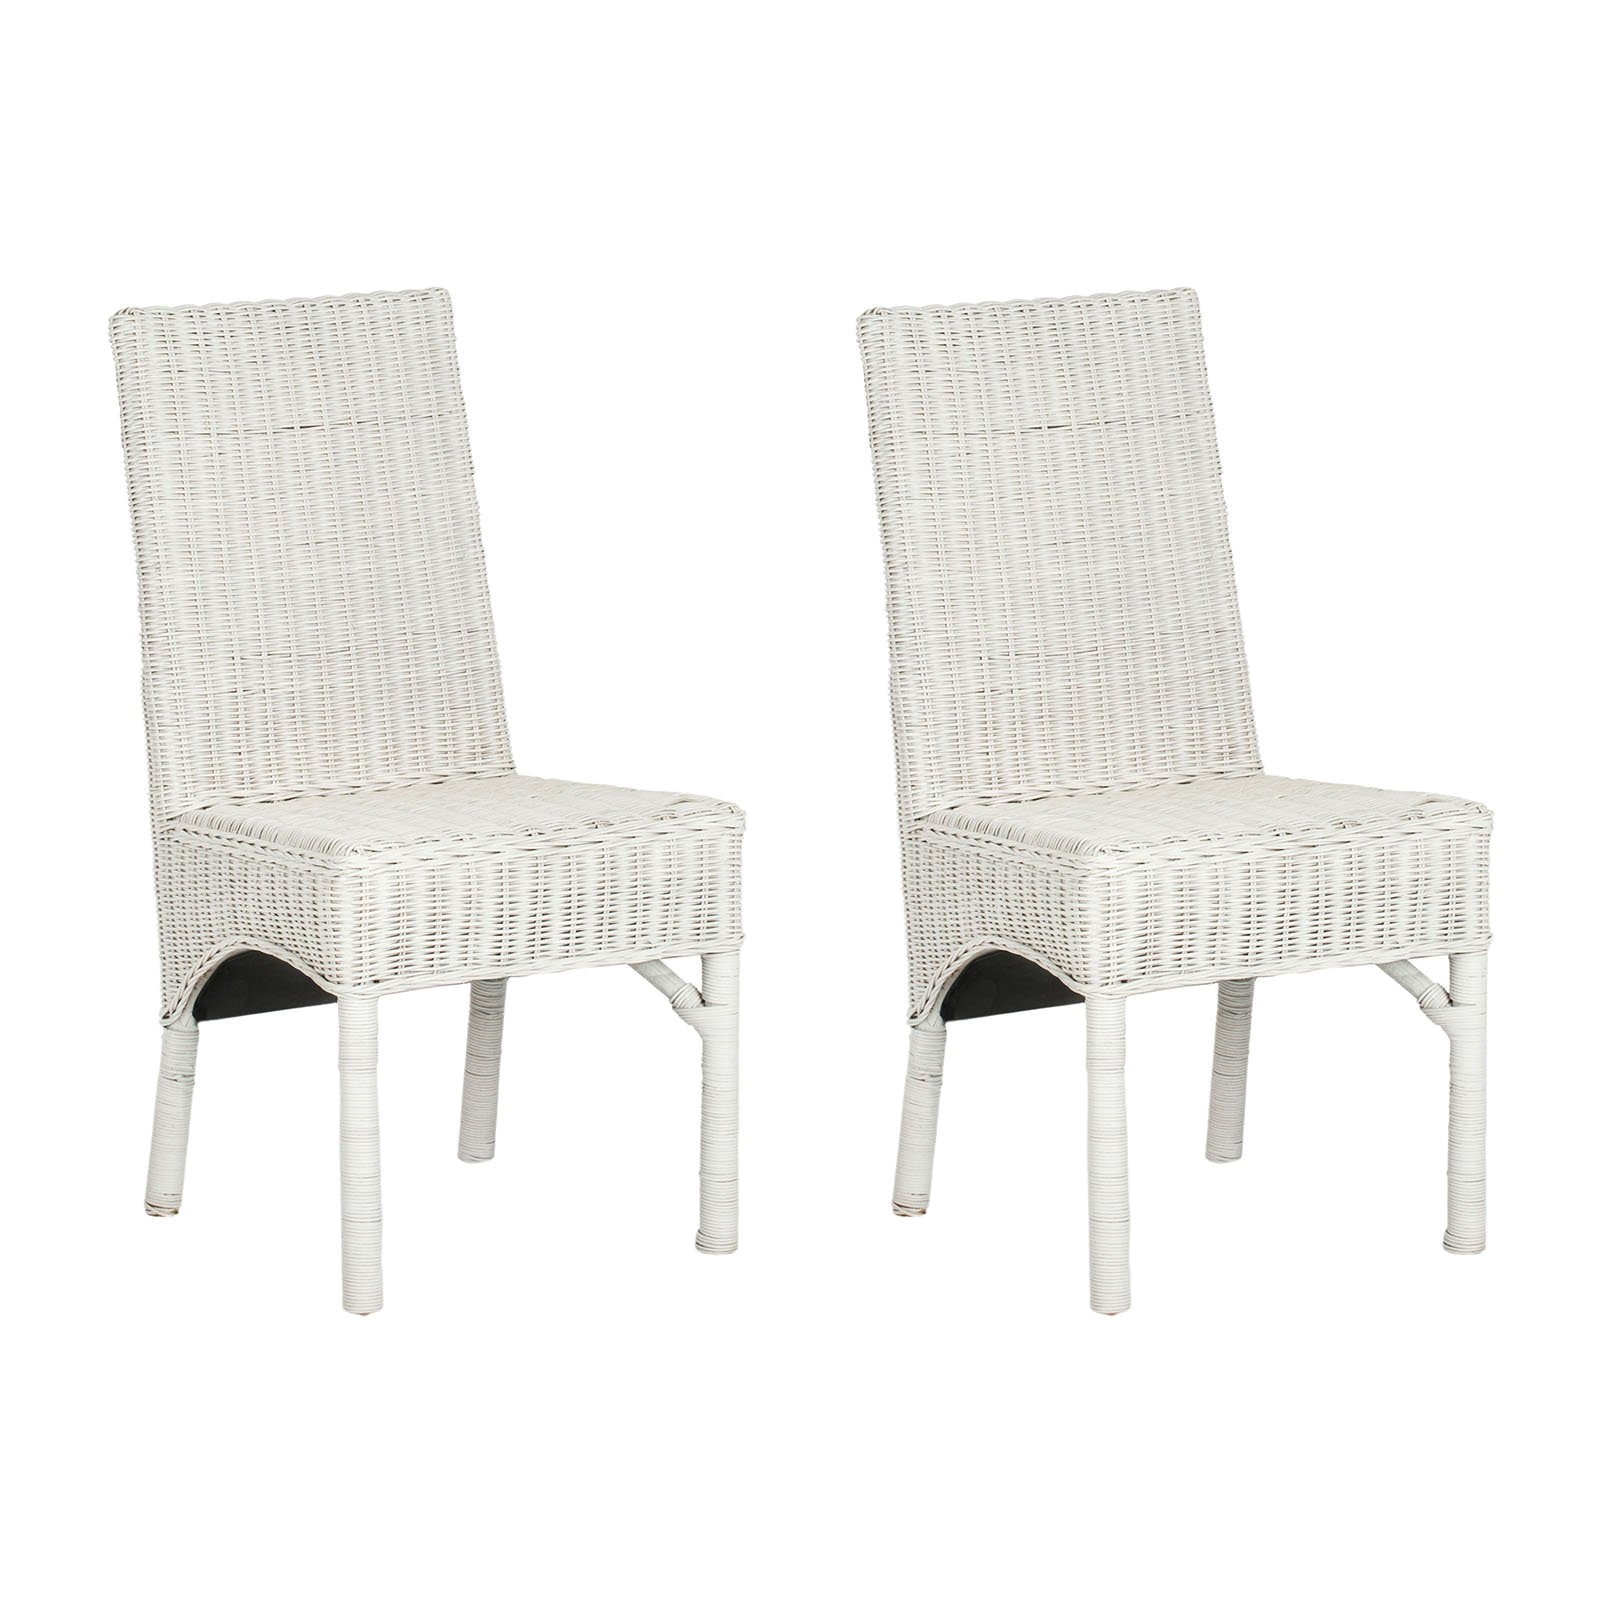 Rattan Meditation Chair Uk Chair Furniture Black Wicker Dining Doom Set Beige Concrete Pool